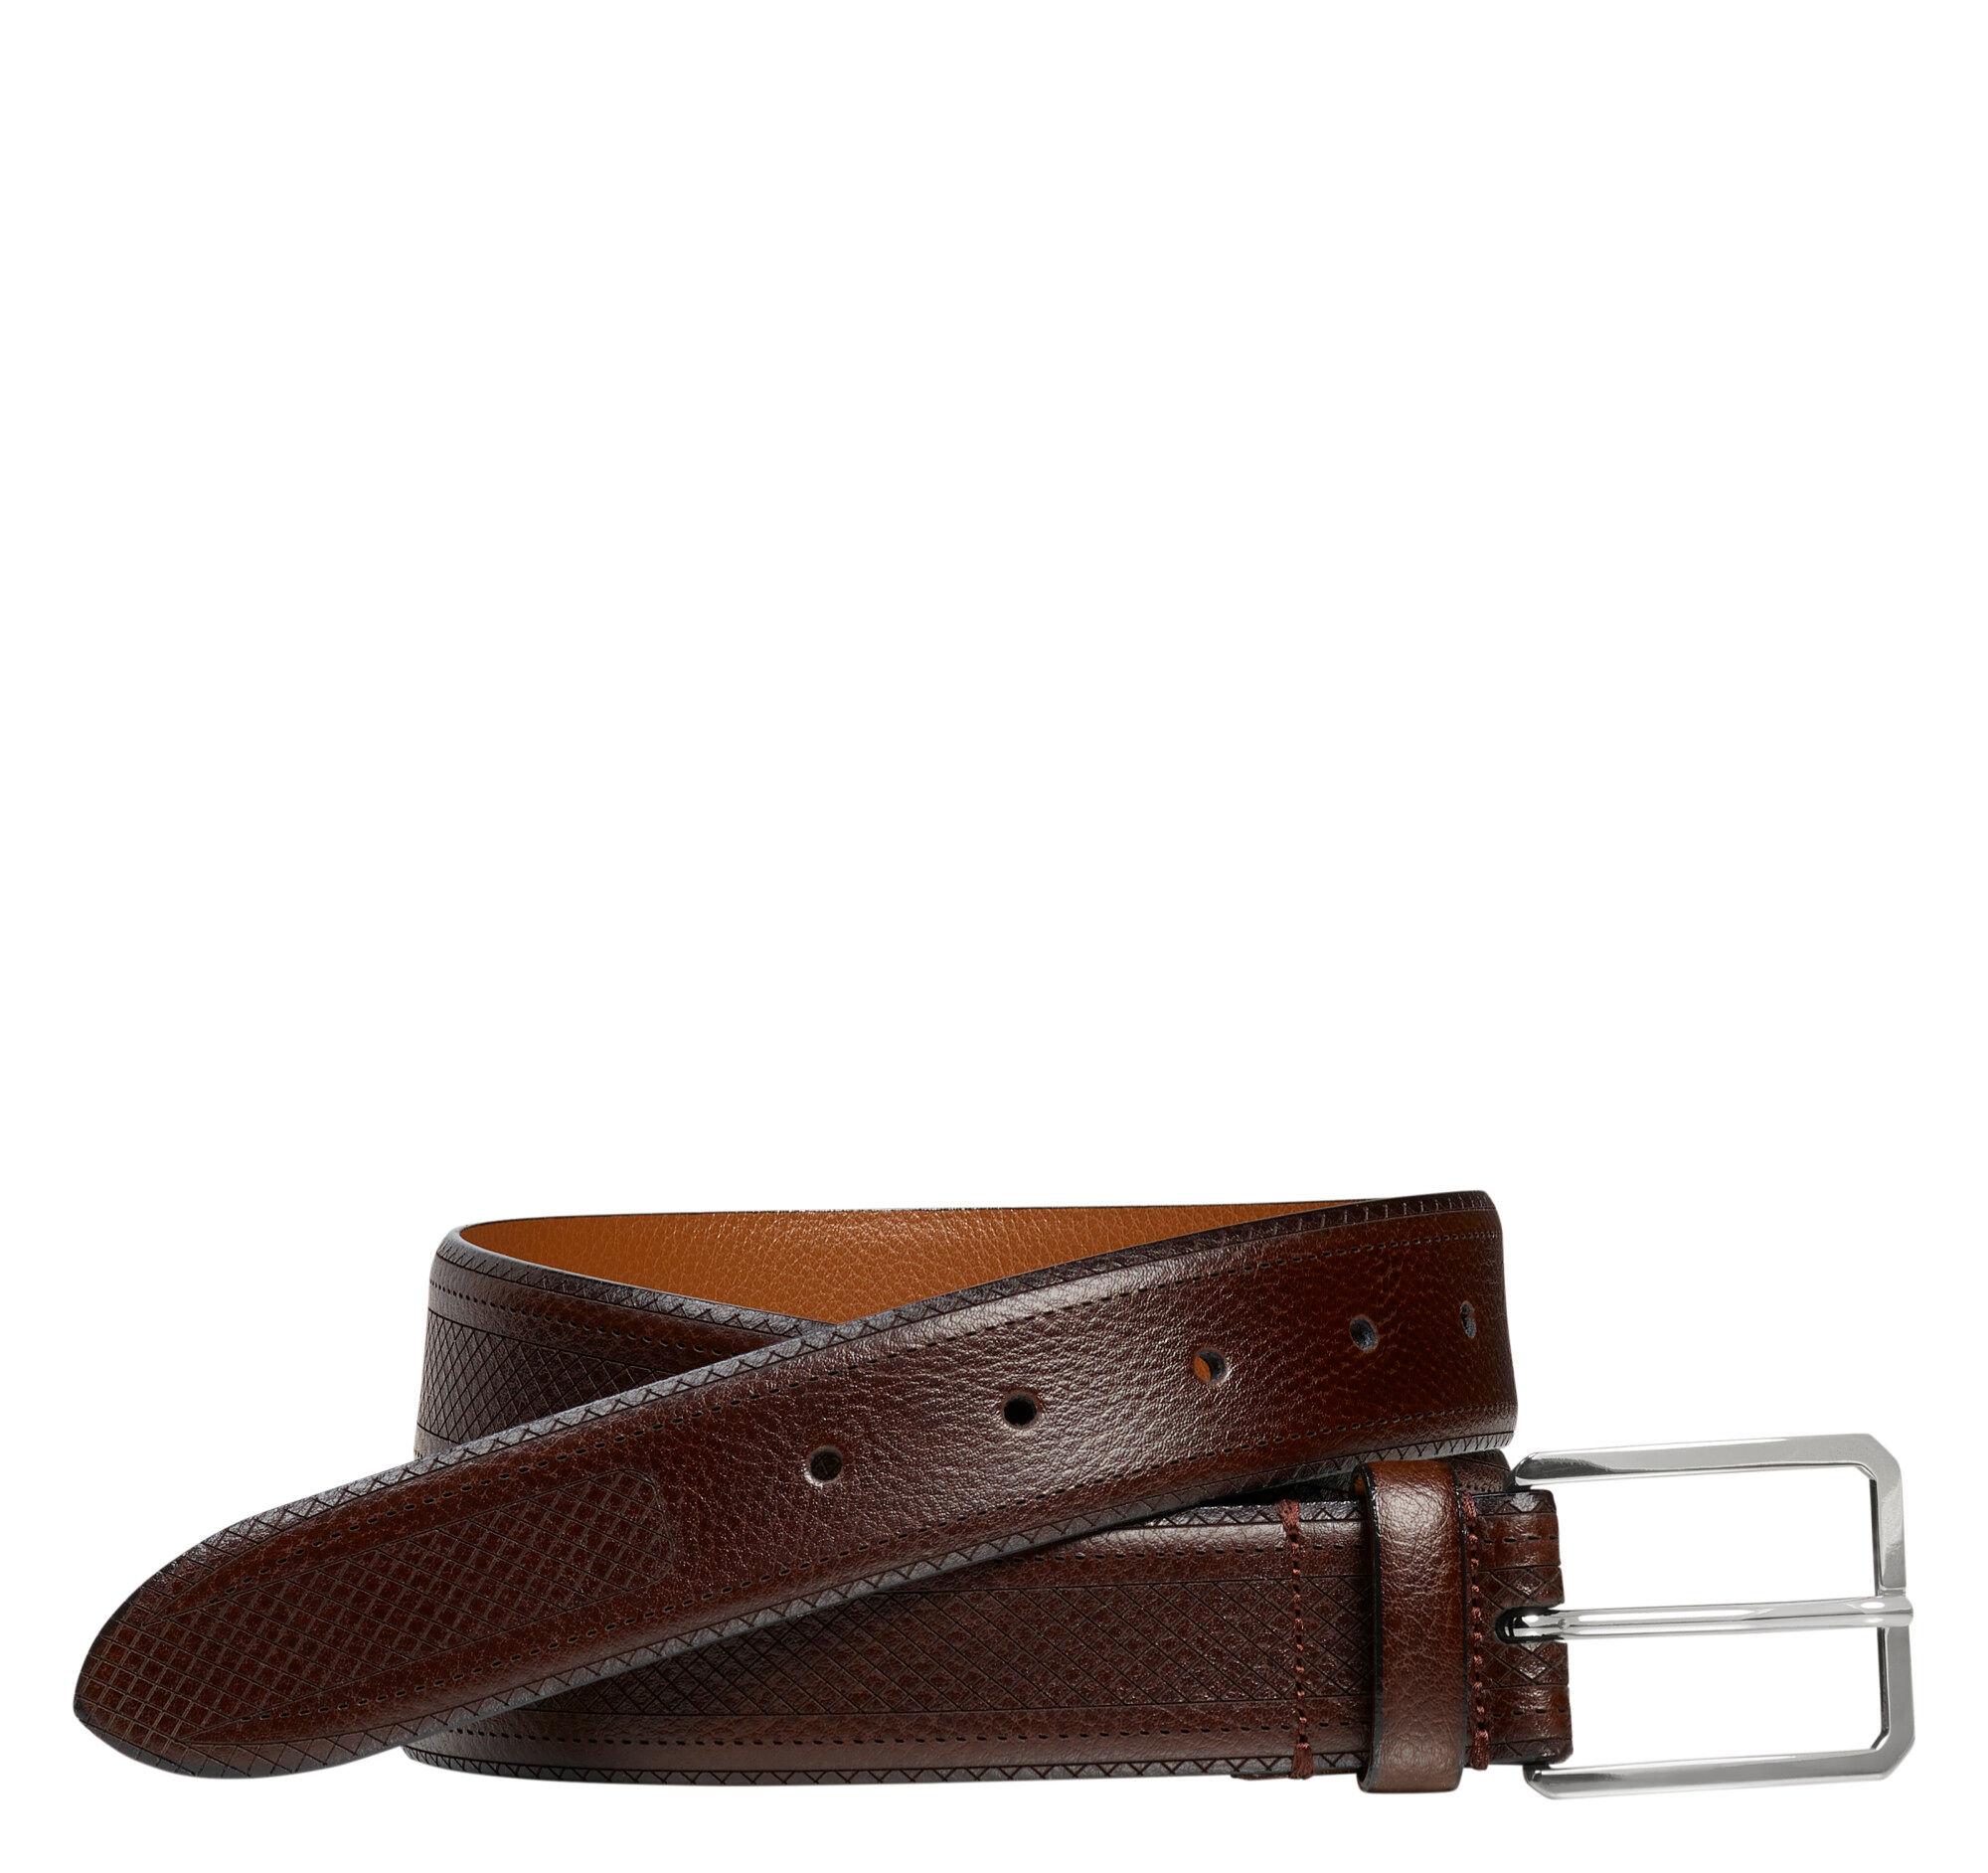 Johnston & Murphy Men's Basketweave Embossed Belt - Brown - Size 38